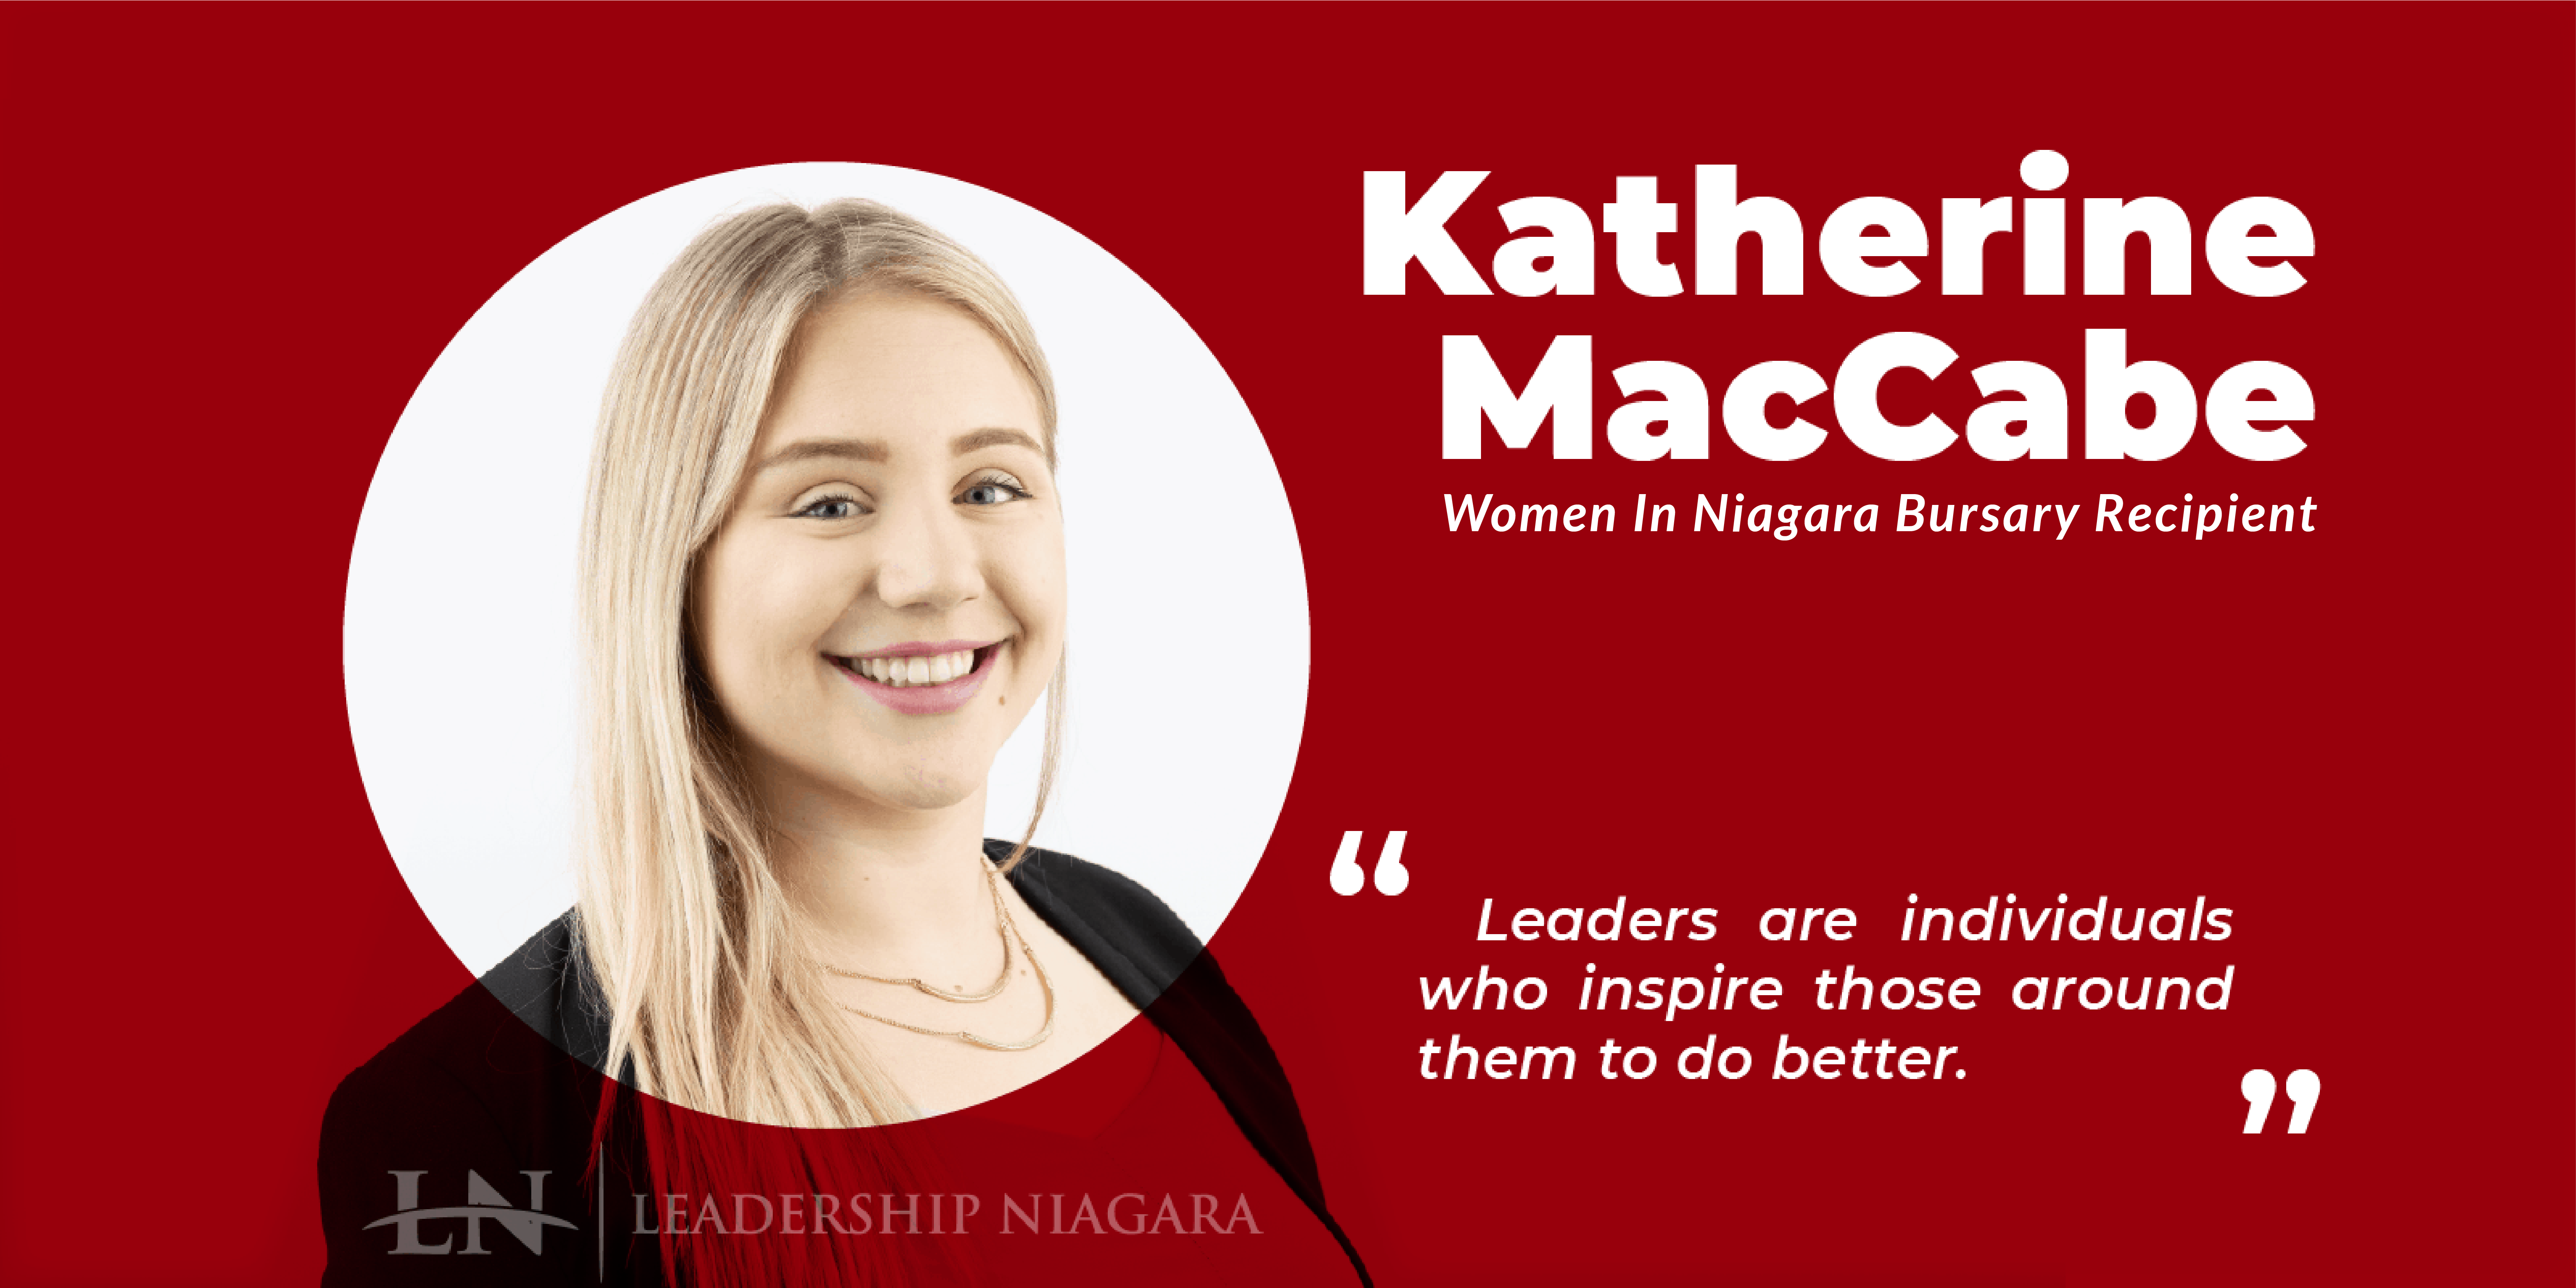 Katherine MacCabe, Women In Niagara Bursary Recipient 2018/19